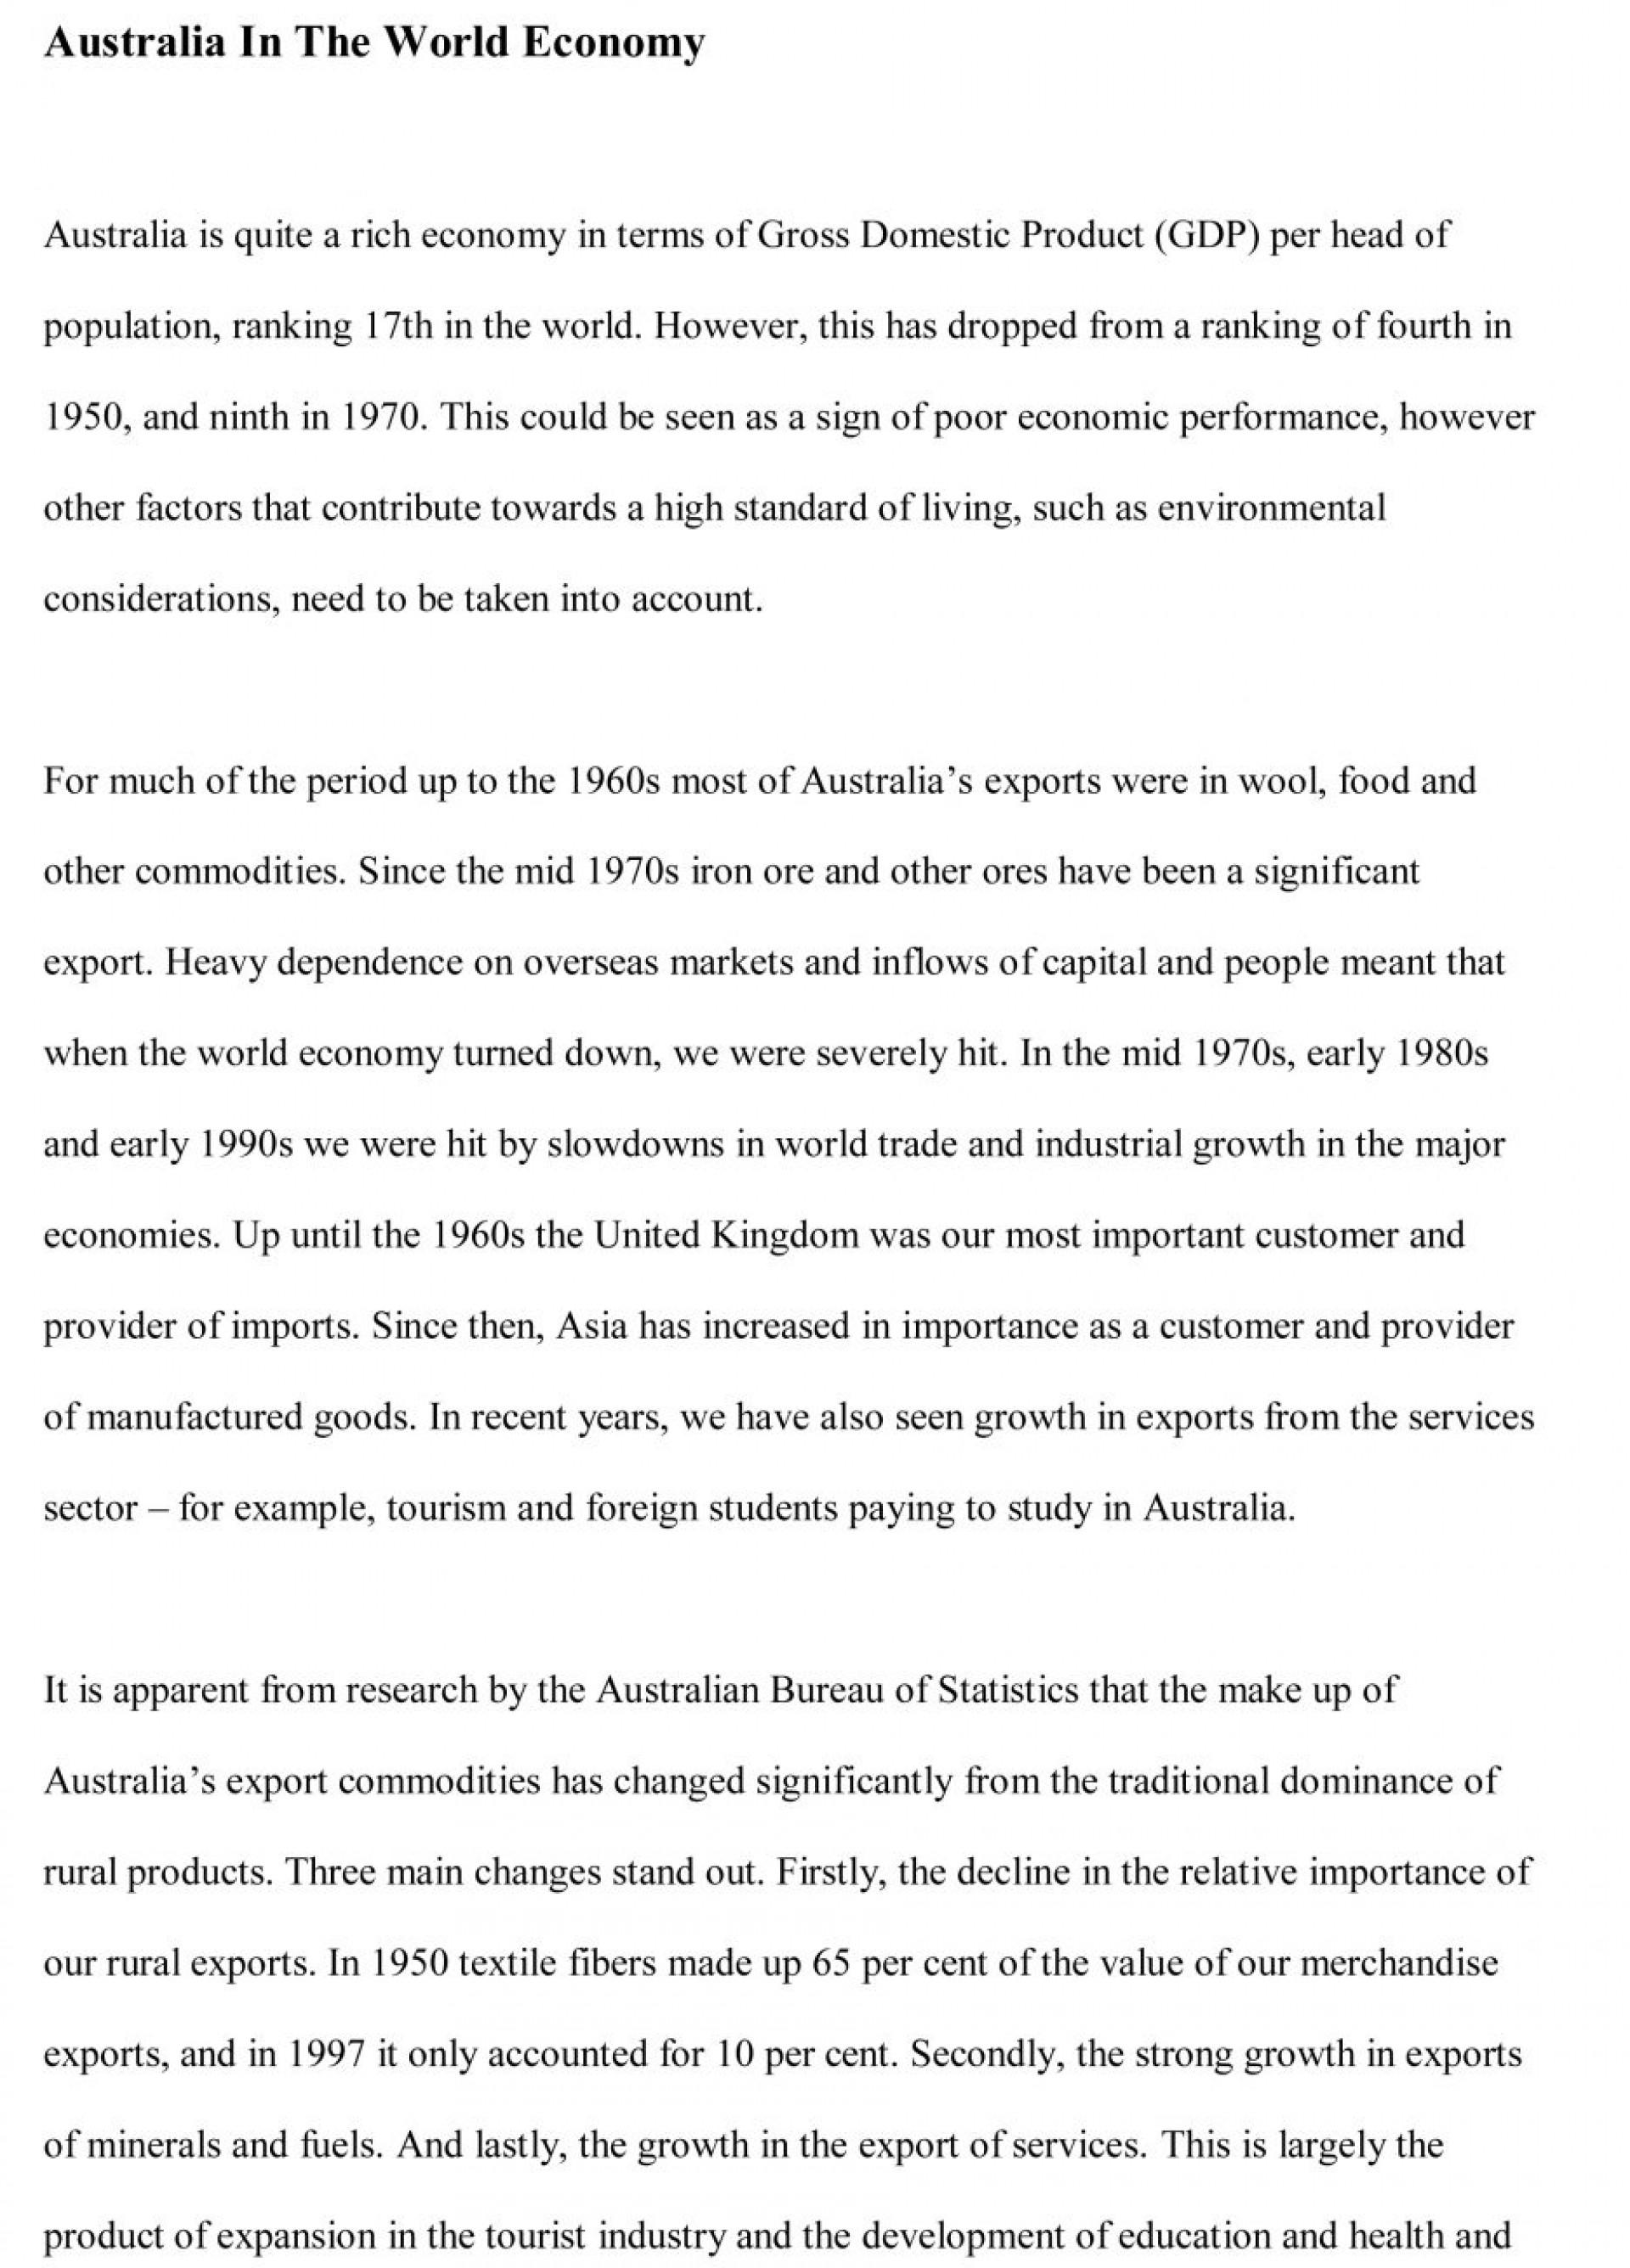 011 This Believe Essays Economics Sample Npr I Narrative Personal Of Prompt Topics Easy On How List 936x1303 Stupendous Essay Examples 1920